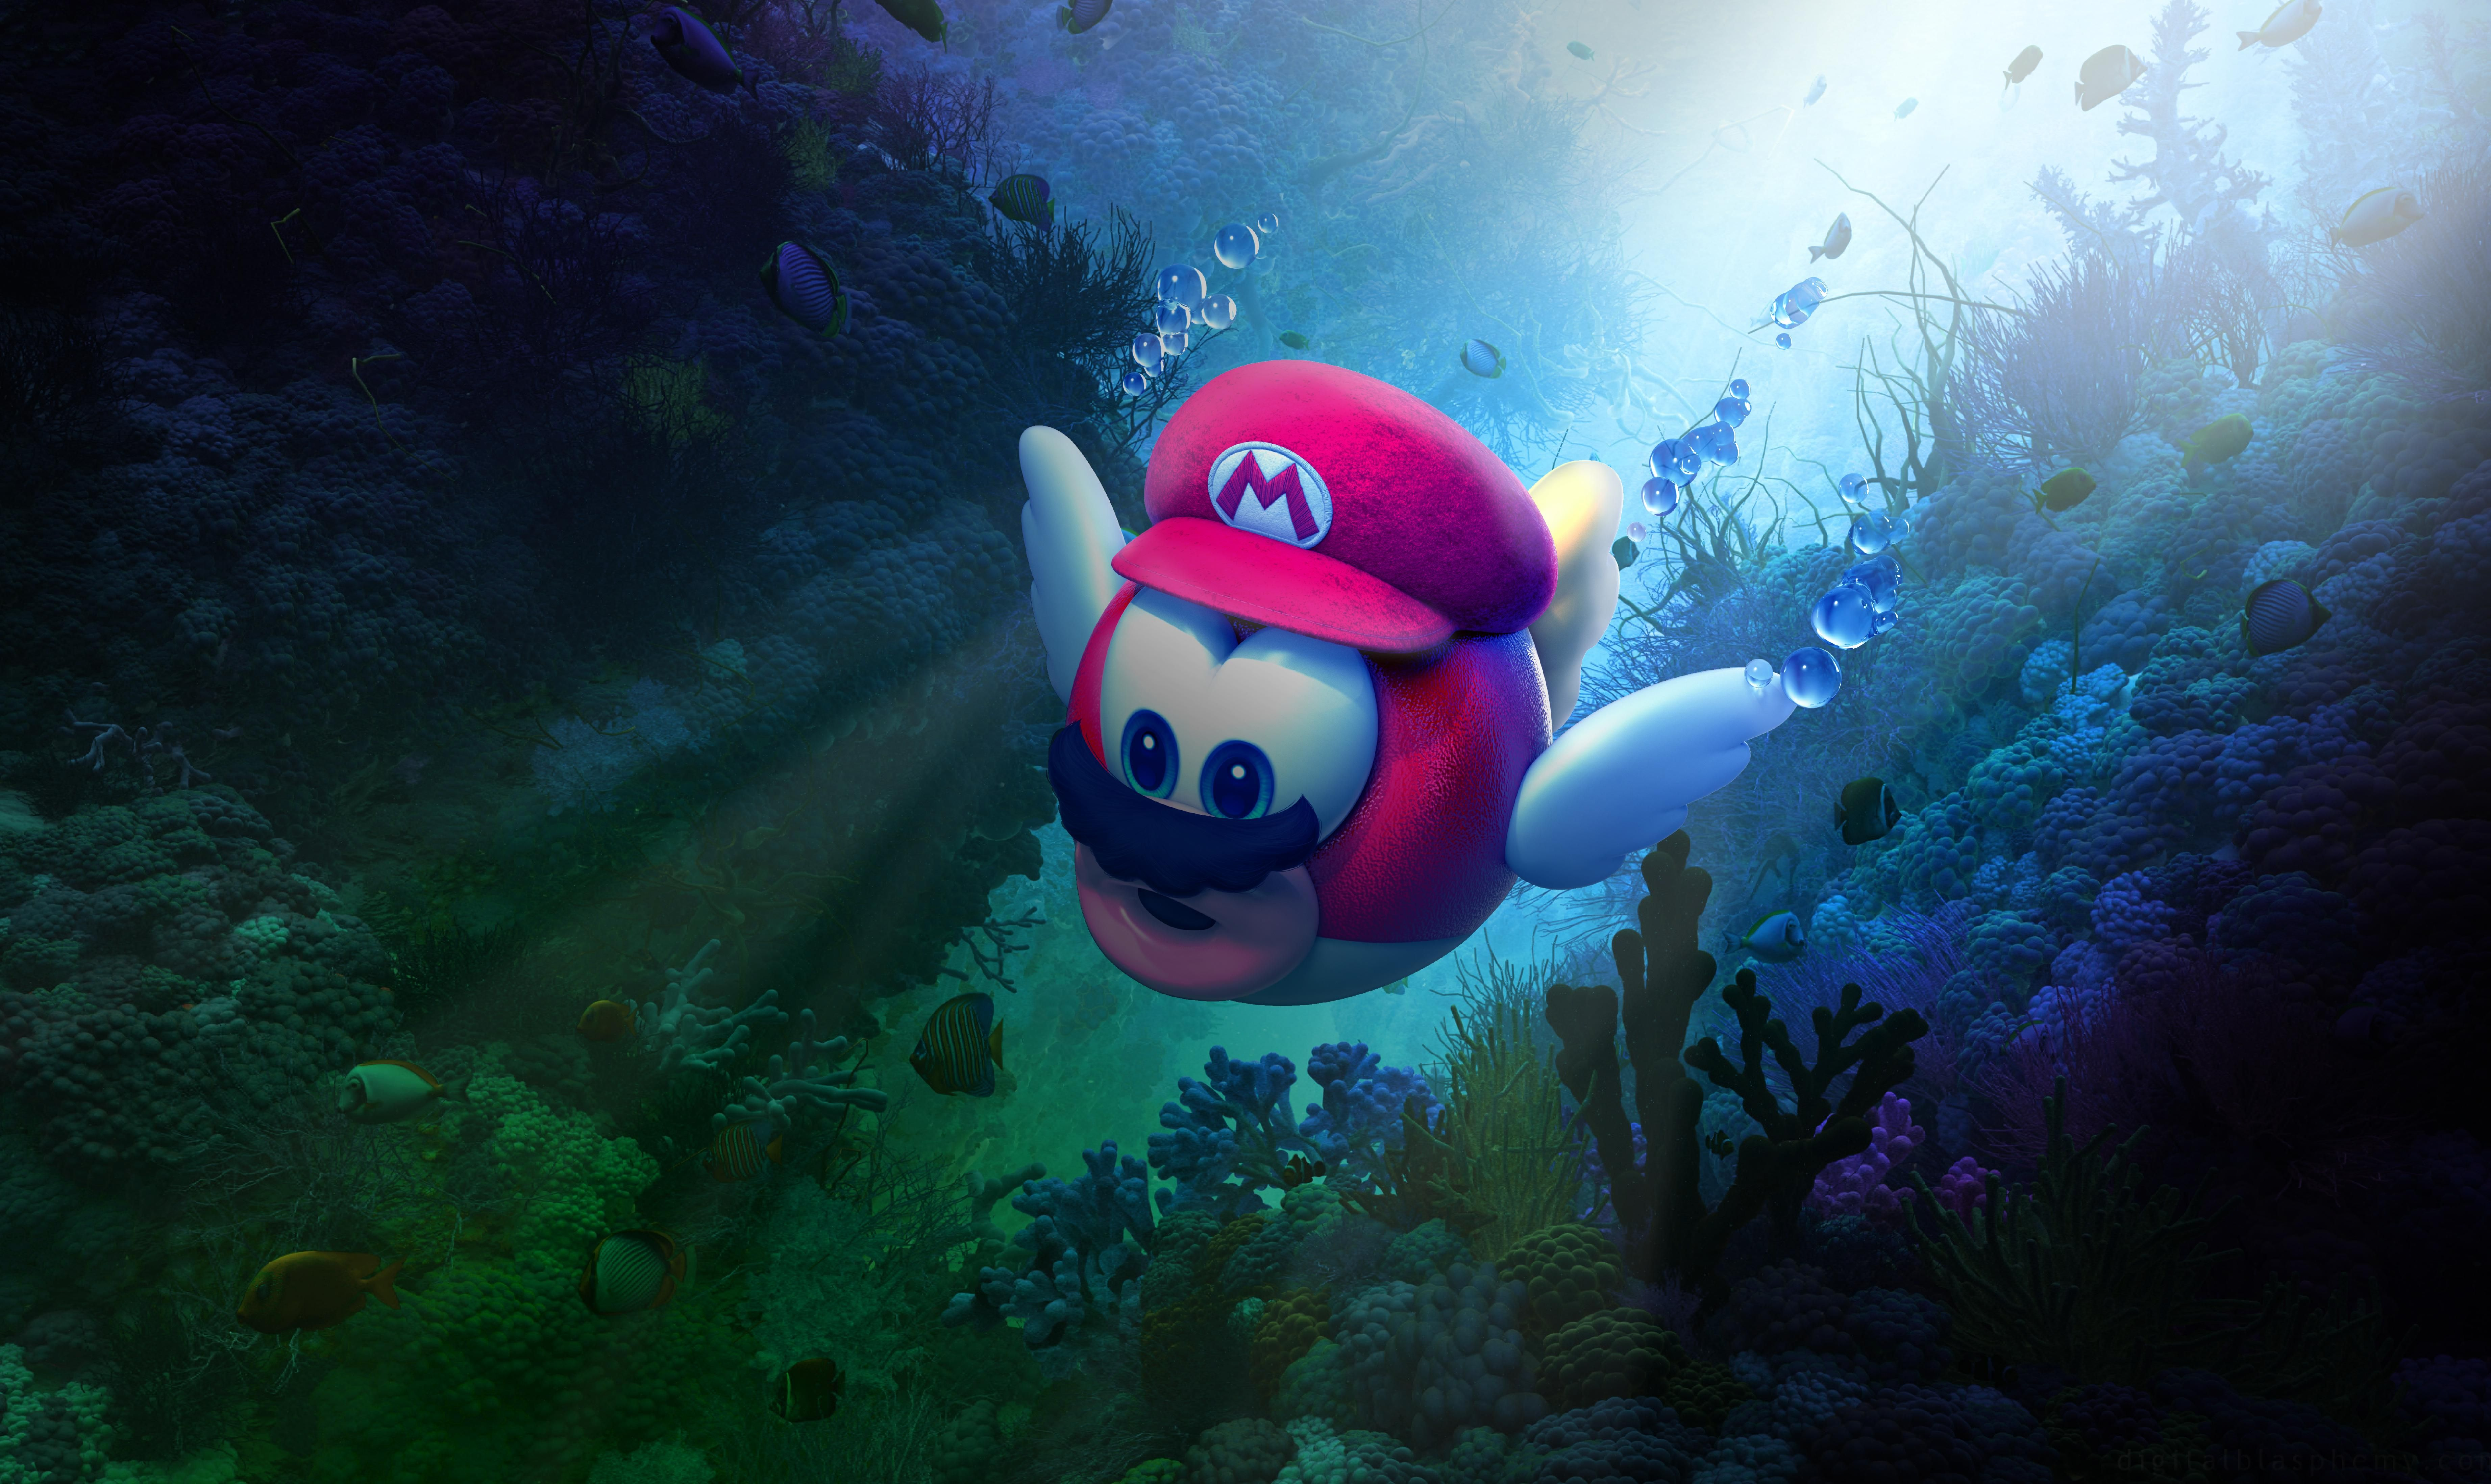 Super Mario Odyssey Games Hd 4k Wallpapers